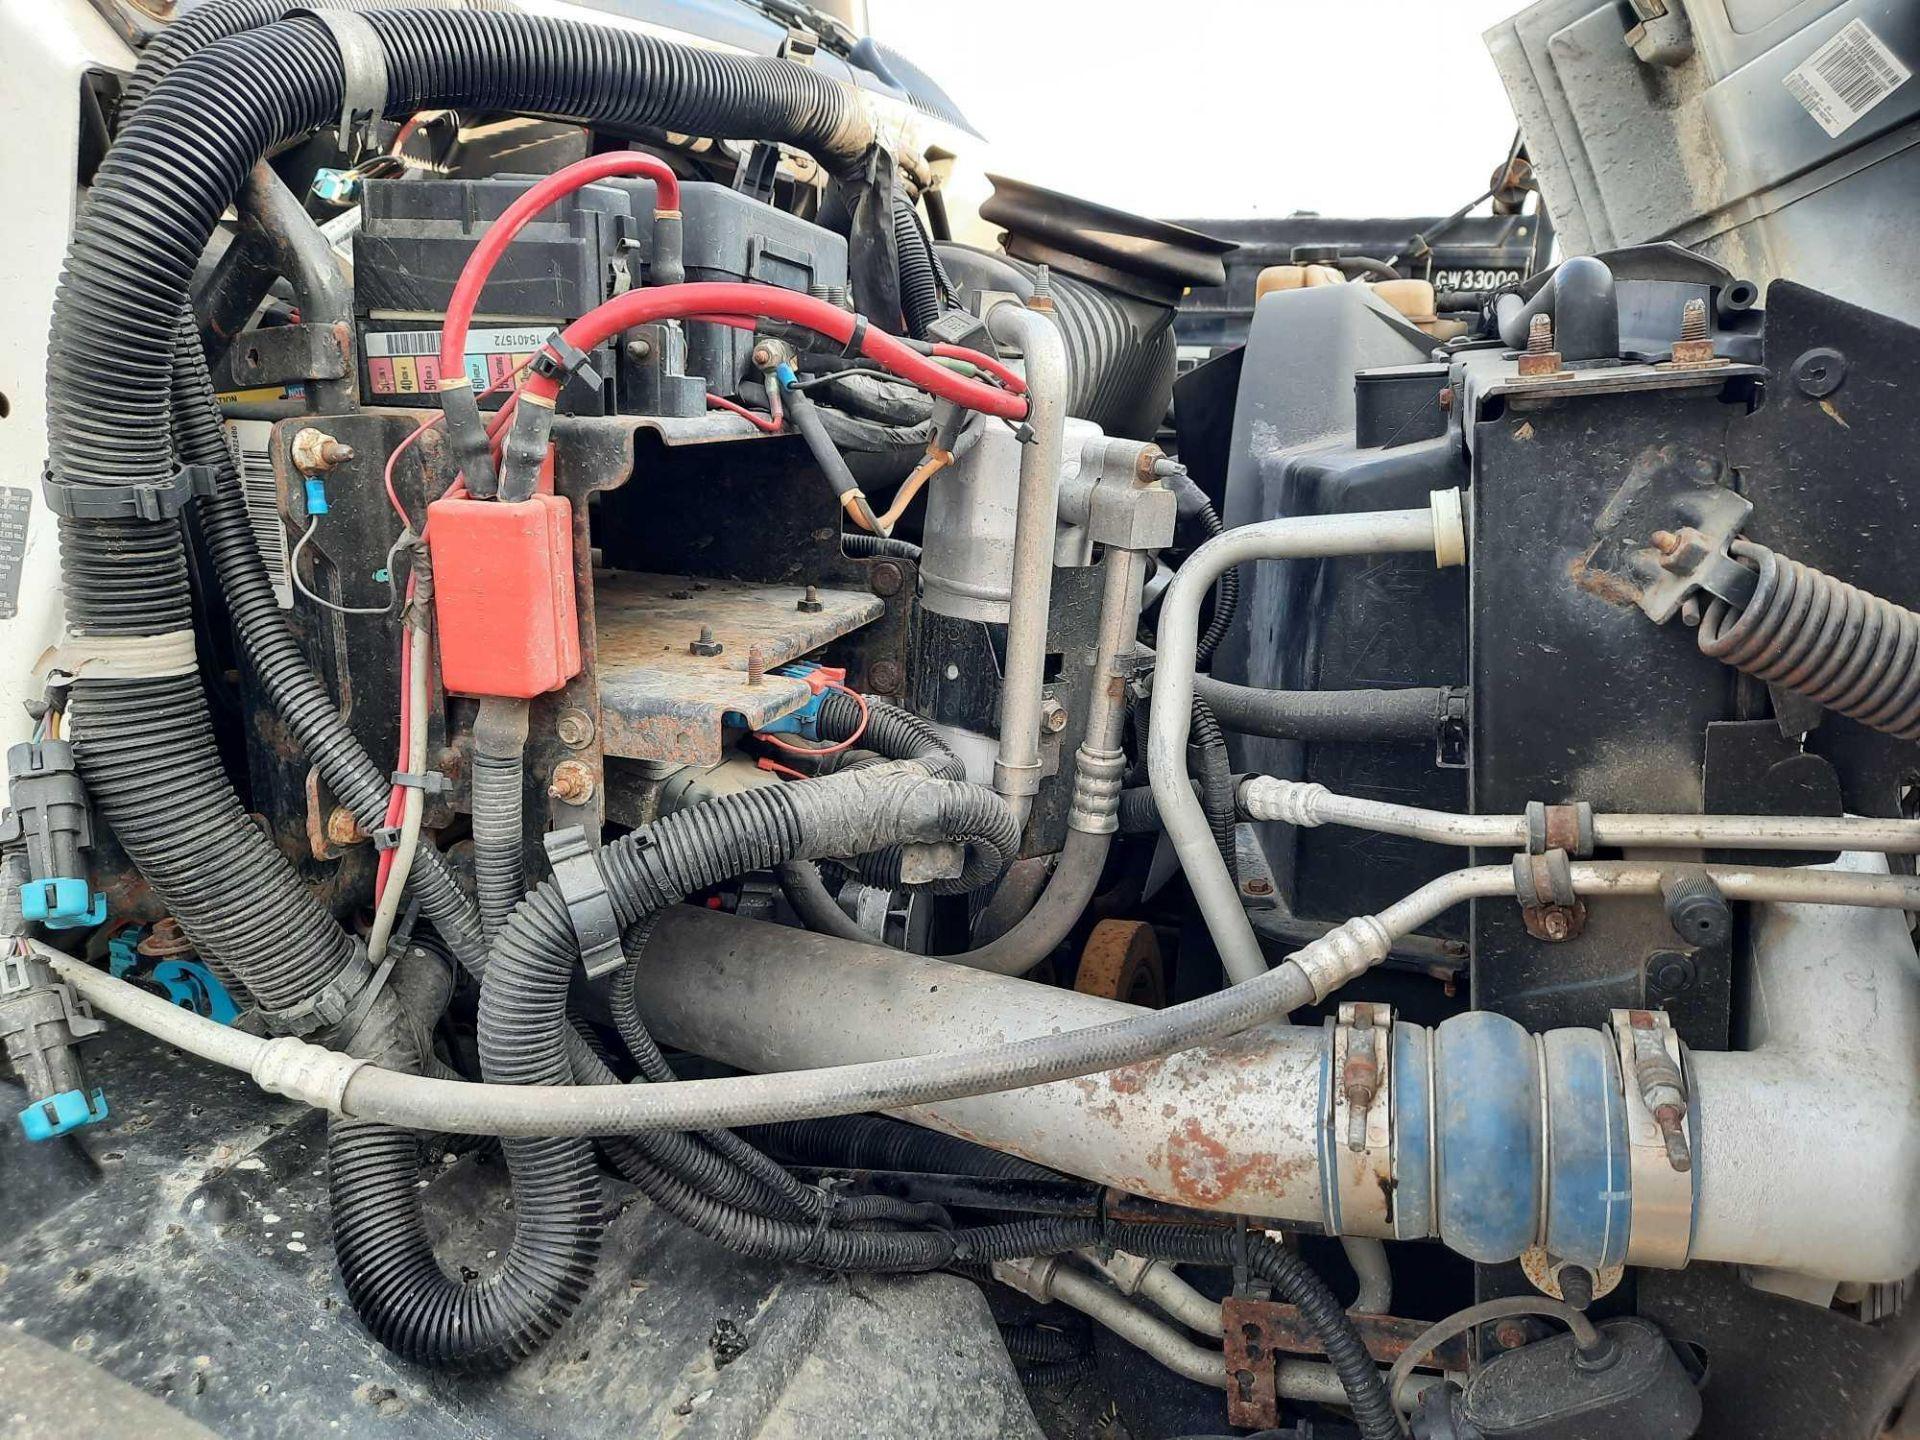 2006 GMC 7500 S/A 10' DUMP TRUCK (VDOT UNIT: R08291) - Image 11 of 19